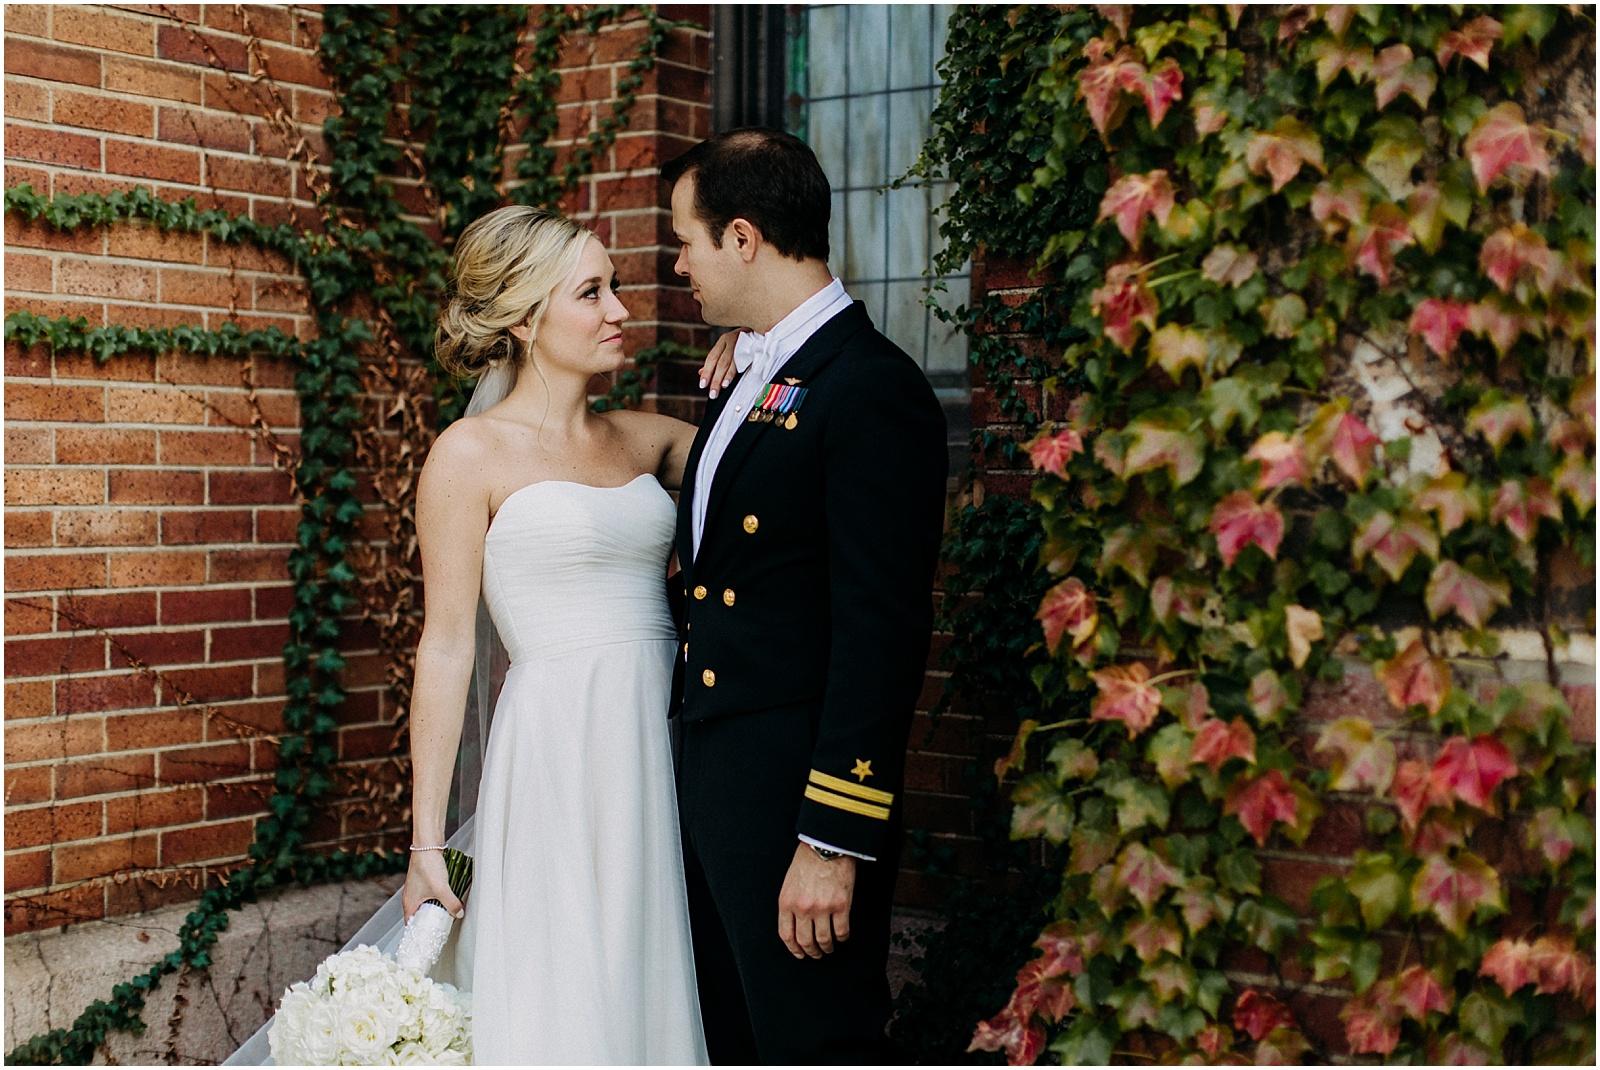 glen_echo_st_louis_mo_wedding_0056.jpg